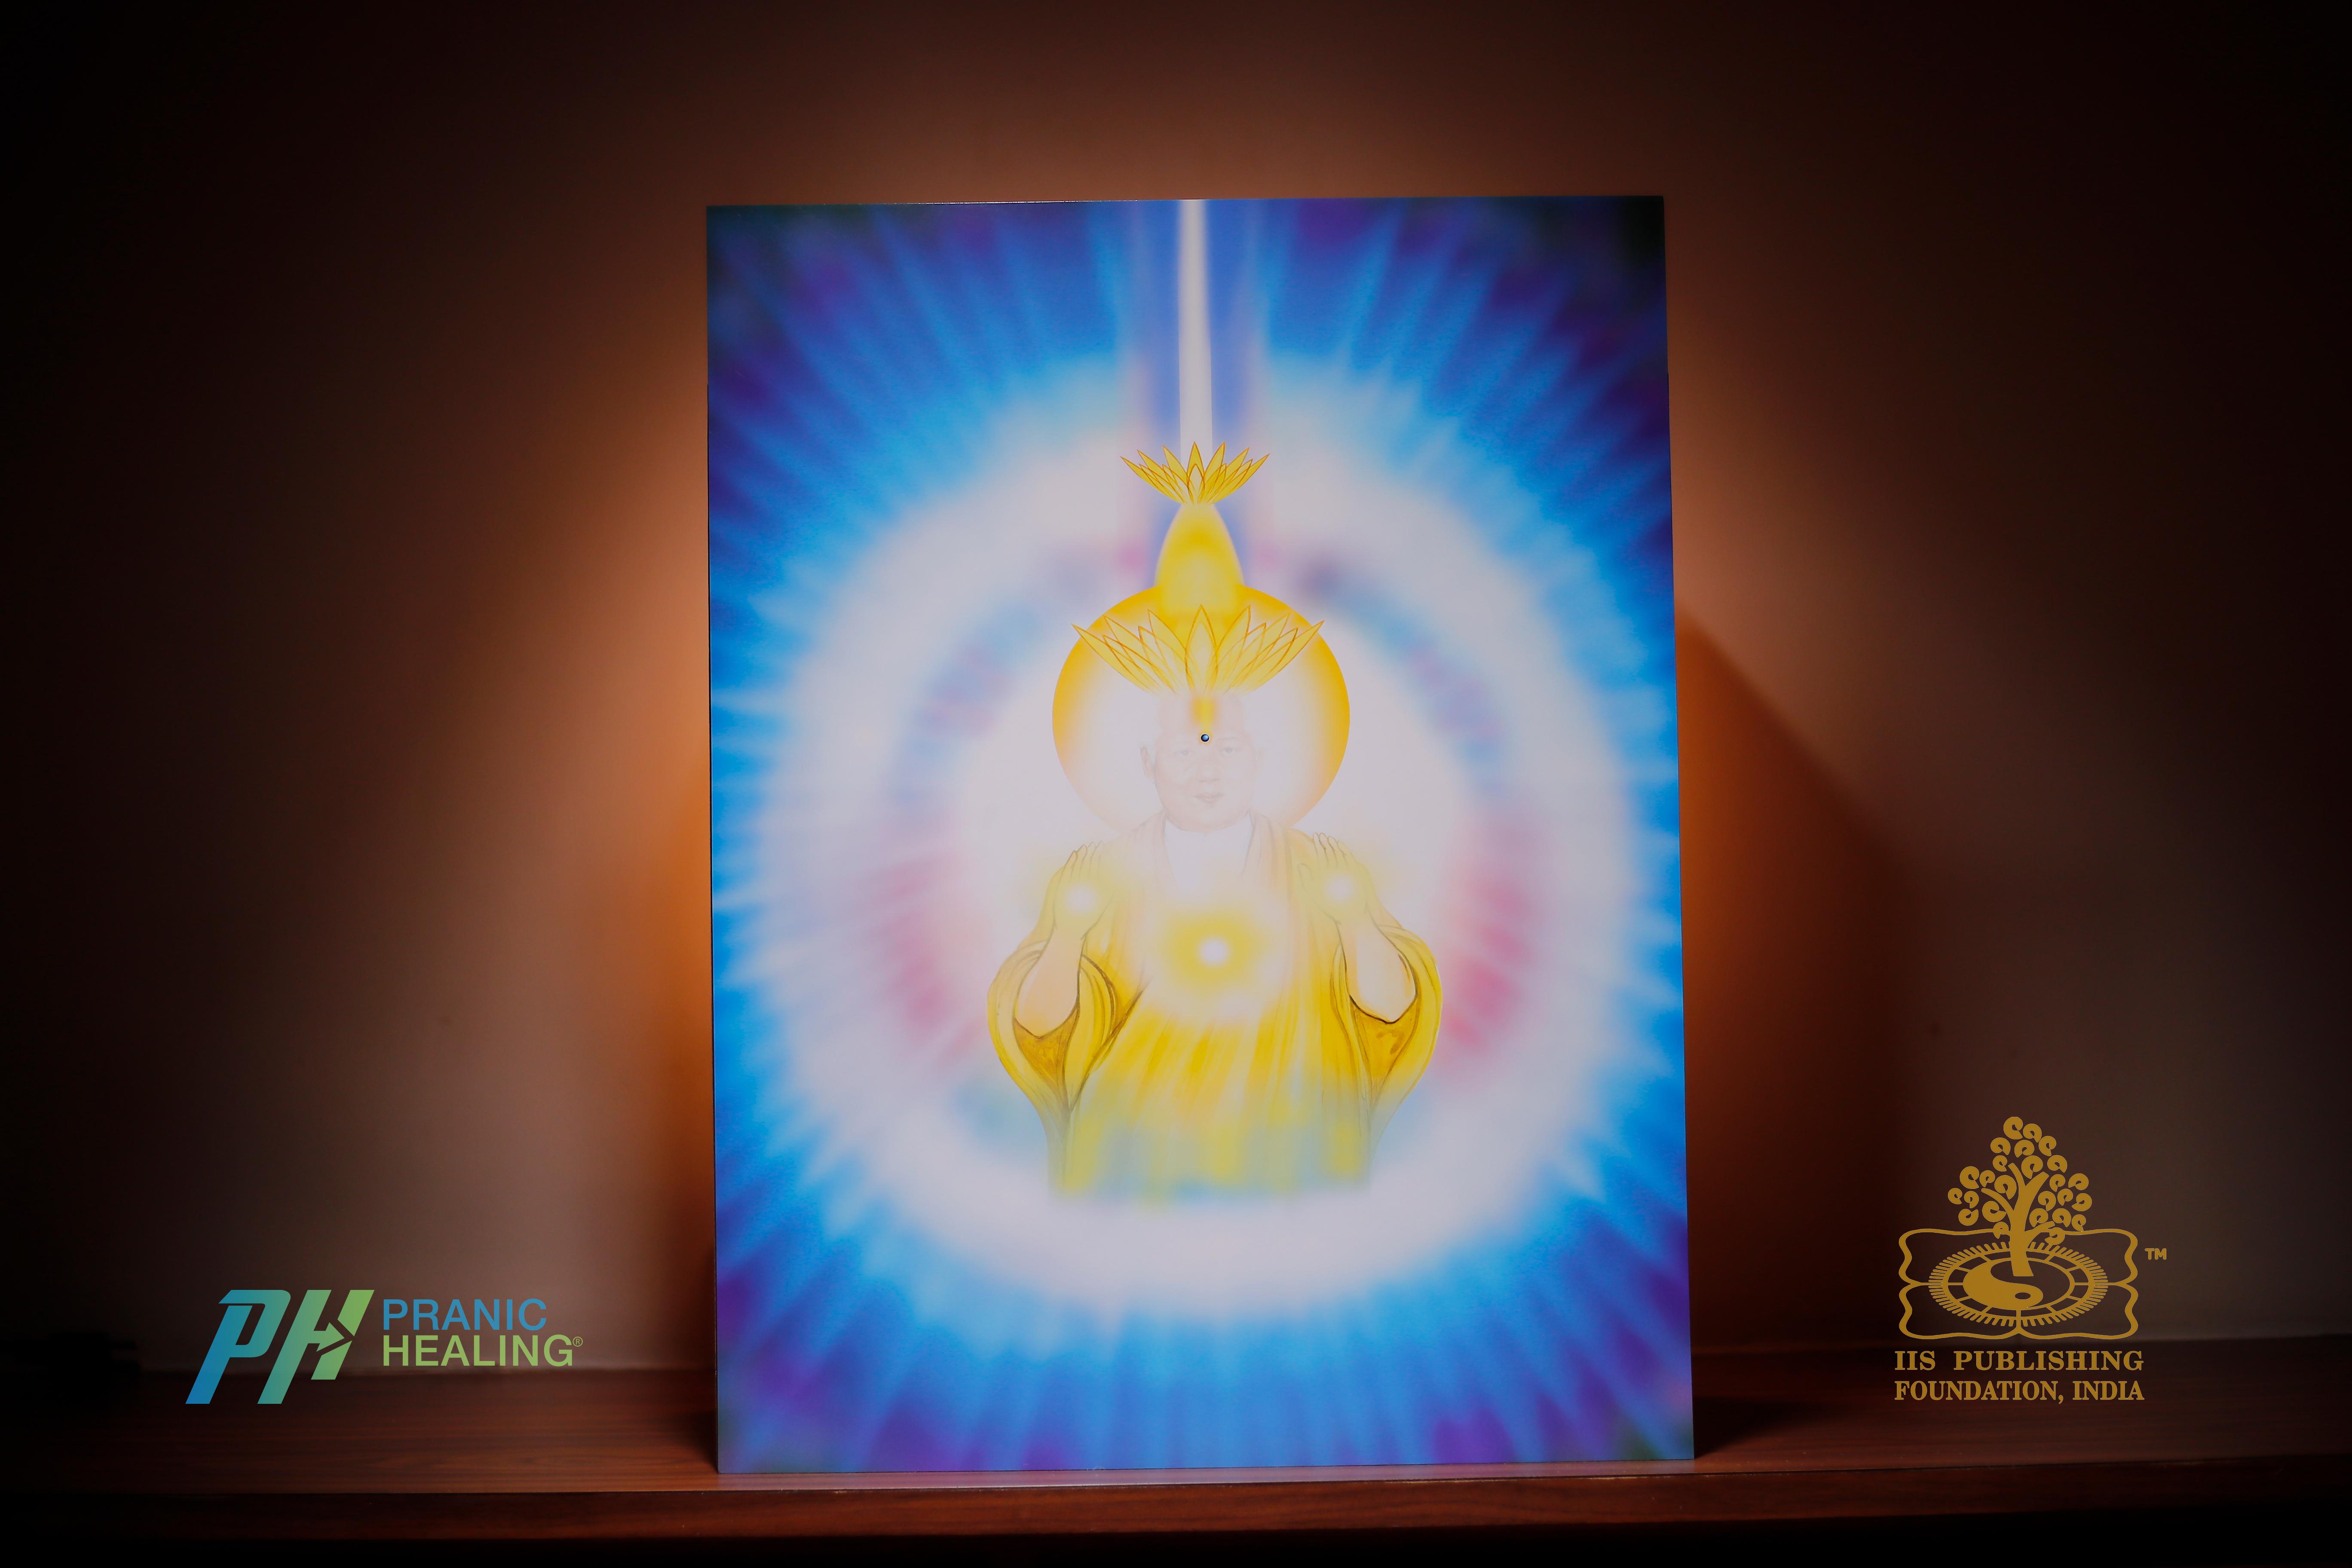 https://shop.pranichealingmumbai.com/products/master-aura-poster